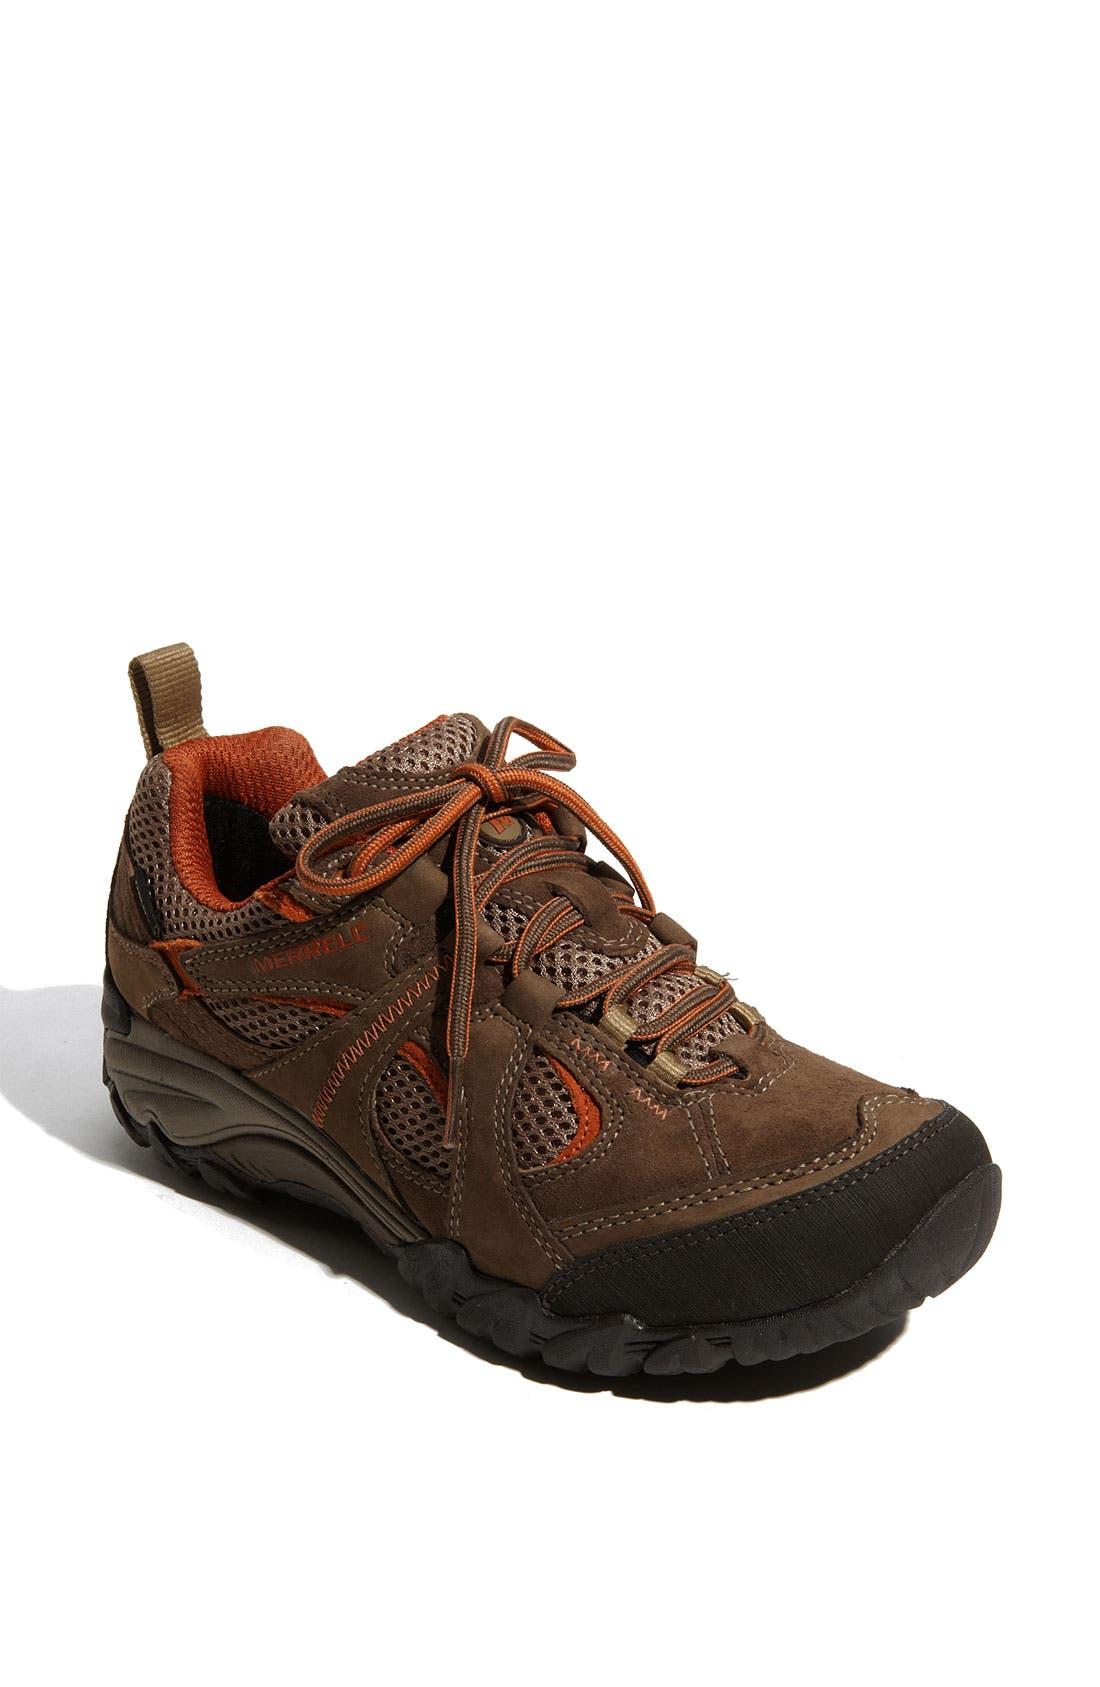 Main Image - Merrell 'Chameleon Arc 2 Wind' Gore-Tex® Walking Shoe (Women)